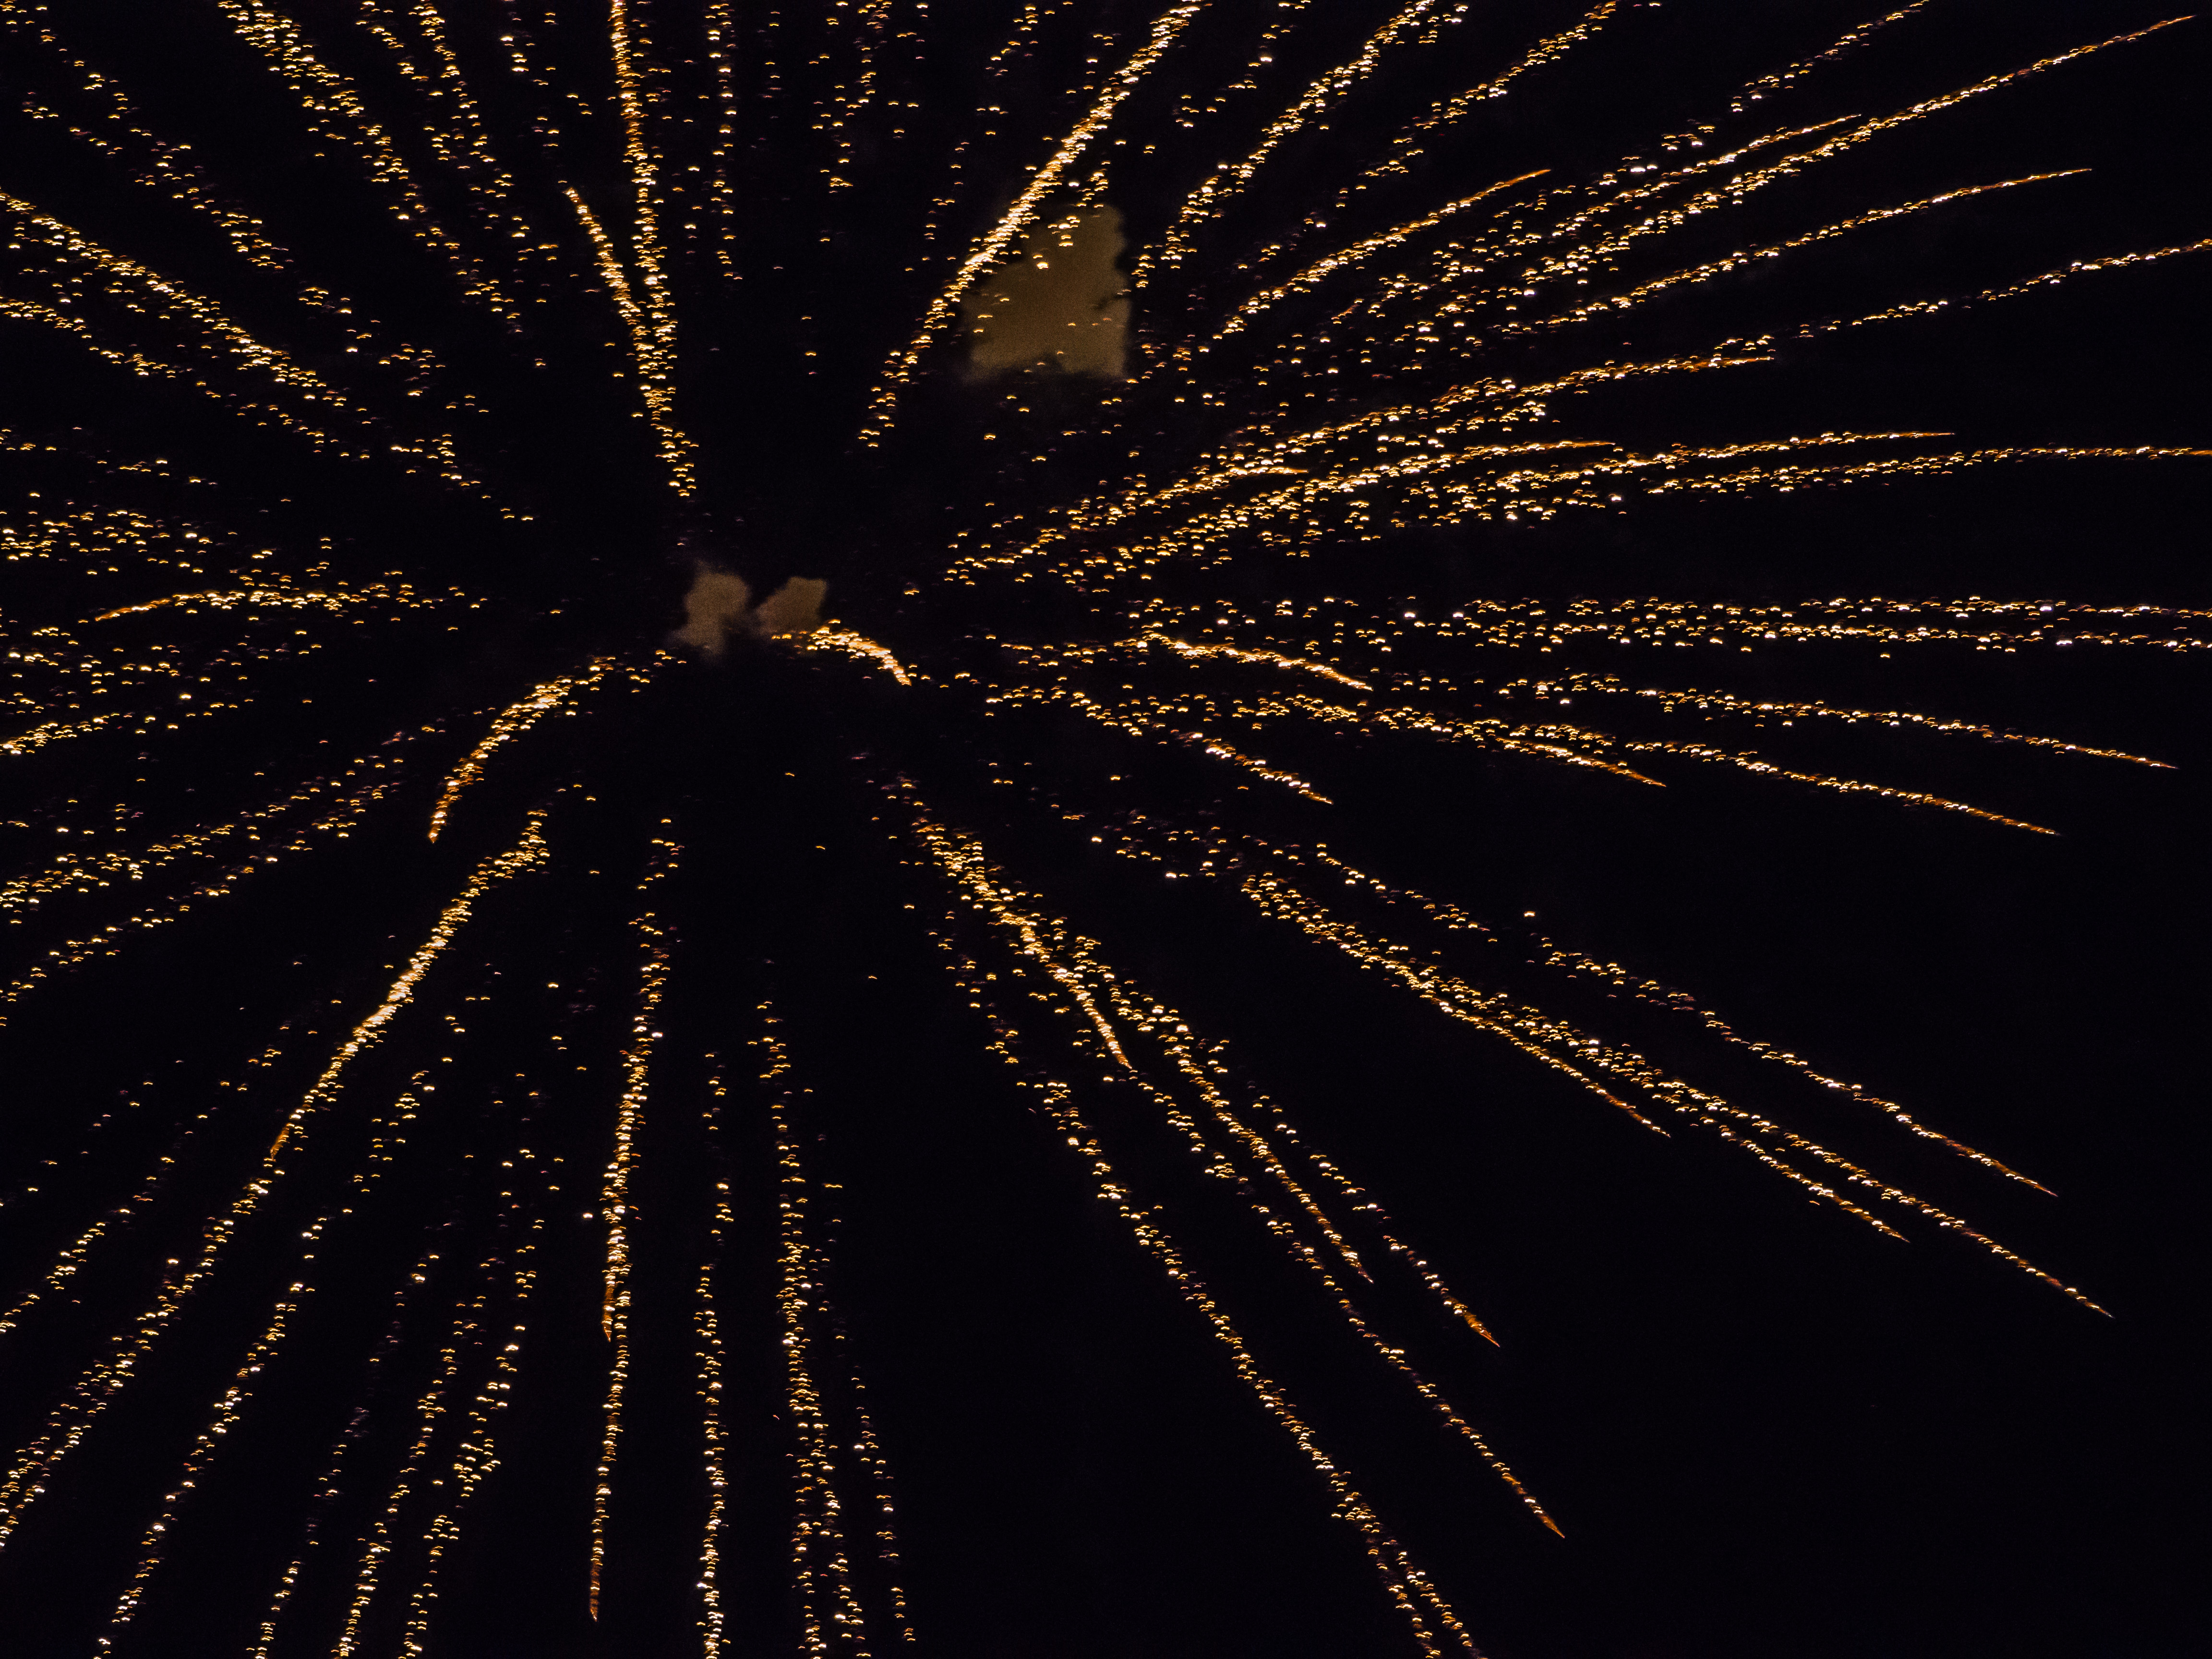 St cyprien pre bastille day fireworks at garrit-france-em10-20150713-p7130354.jpg photo